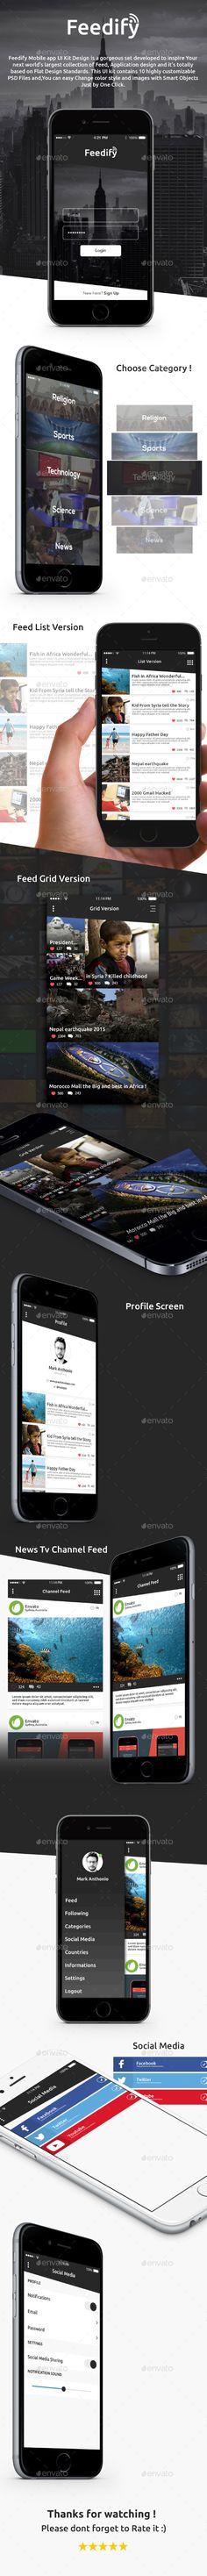 Feedify News Feed Mobile App UI Kit Design